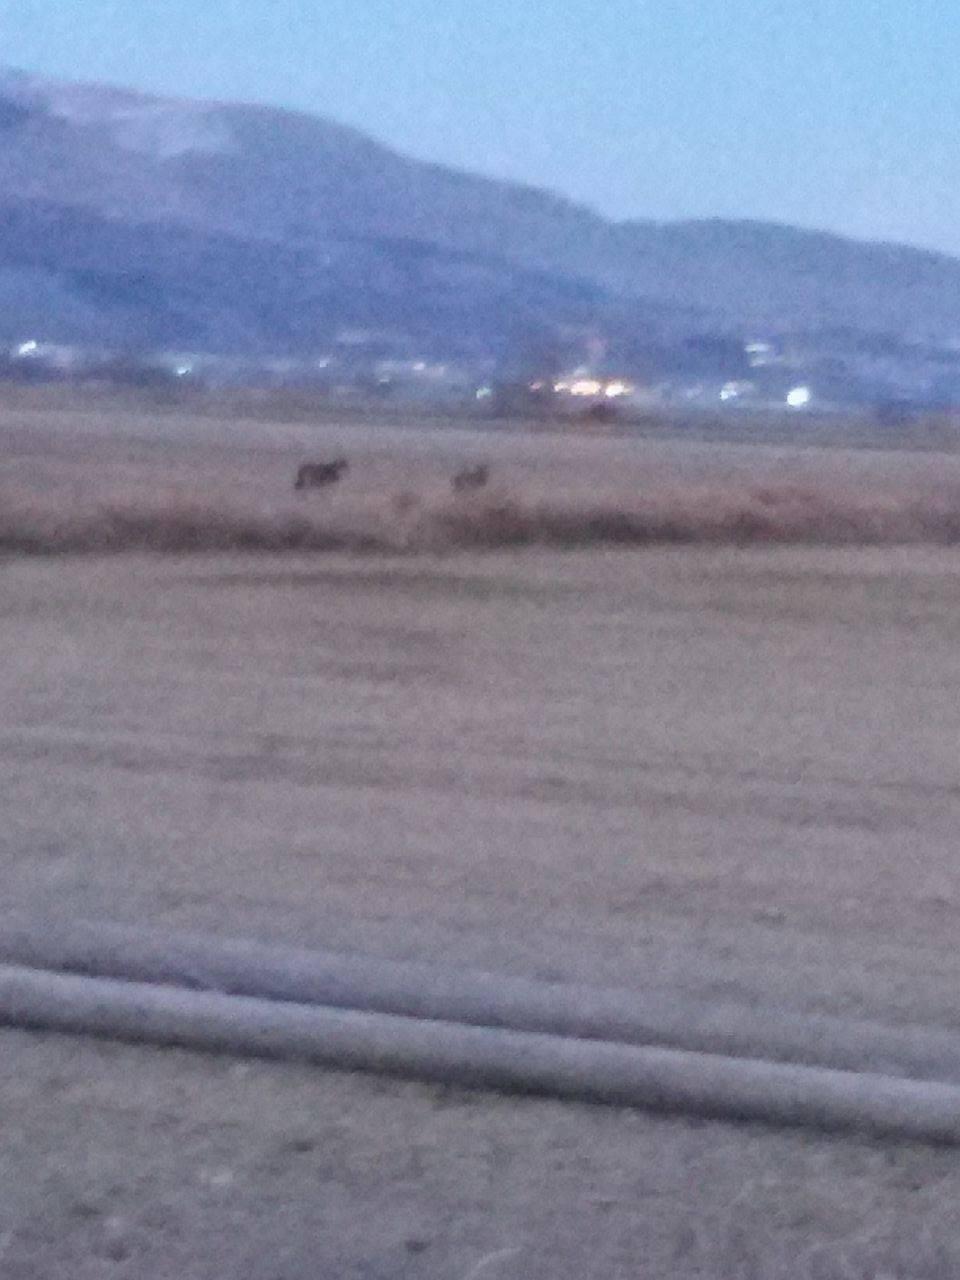 Paterno, avvistati due lupi in campagna